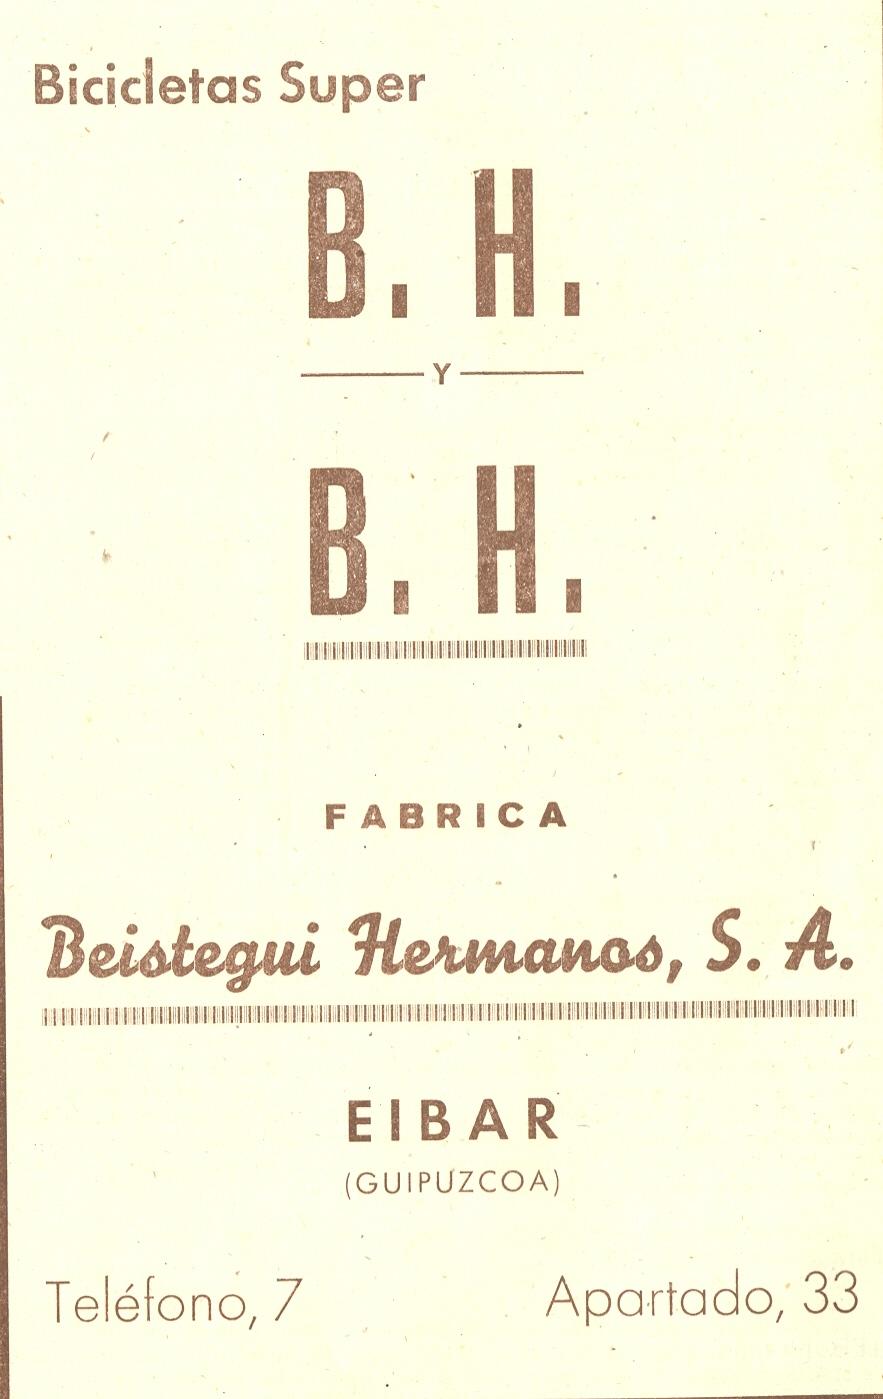 21) Beistegui hermanos, s.a.(BH)